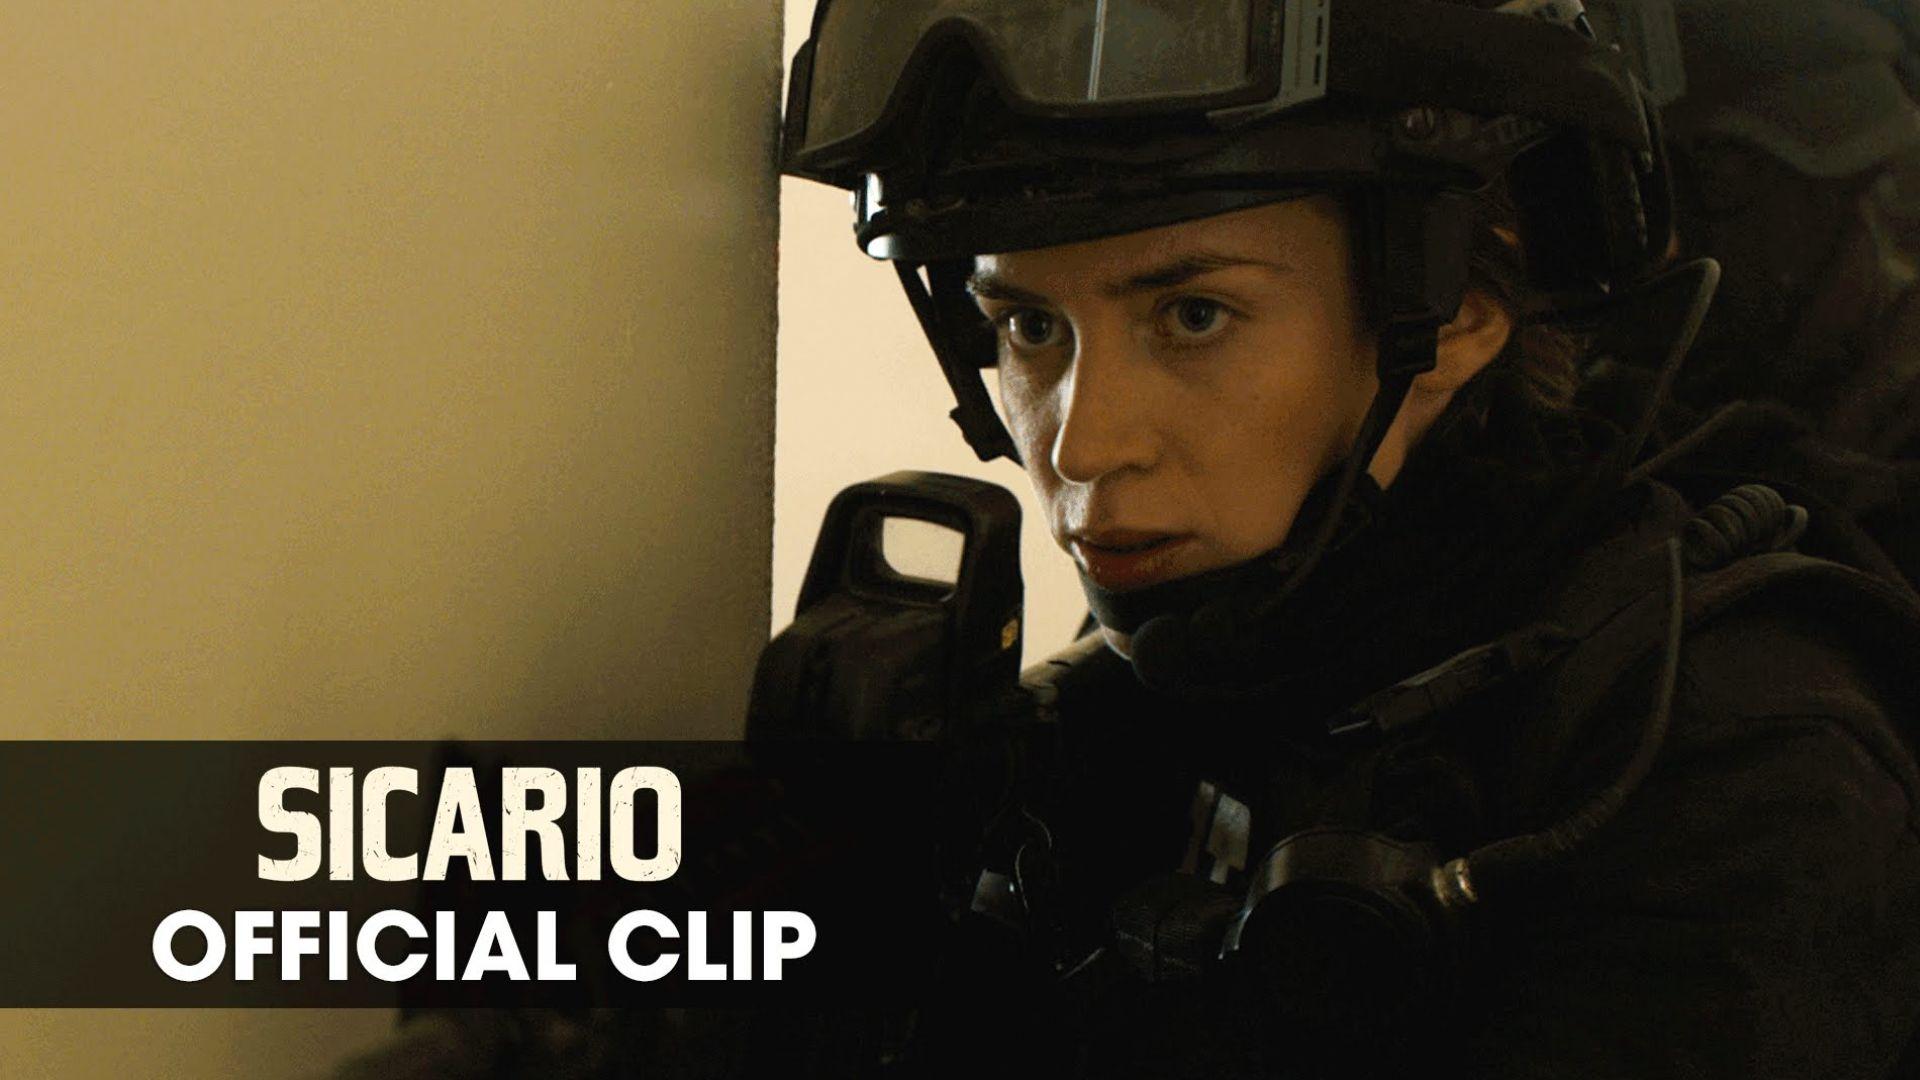 Emily Blunt Raids House in new 'Sicario' Clip